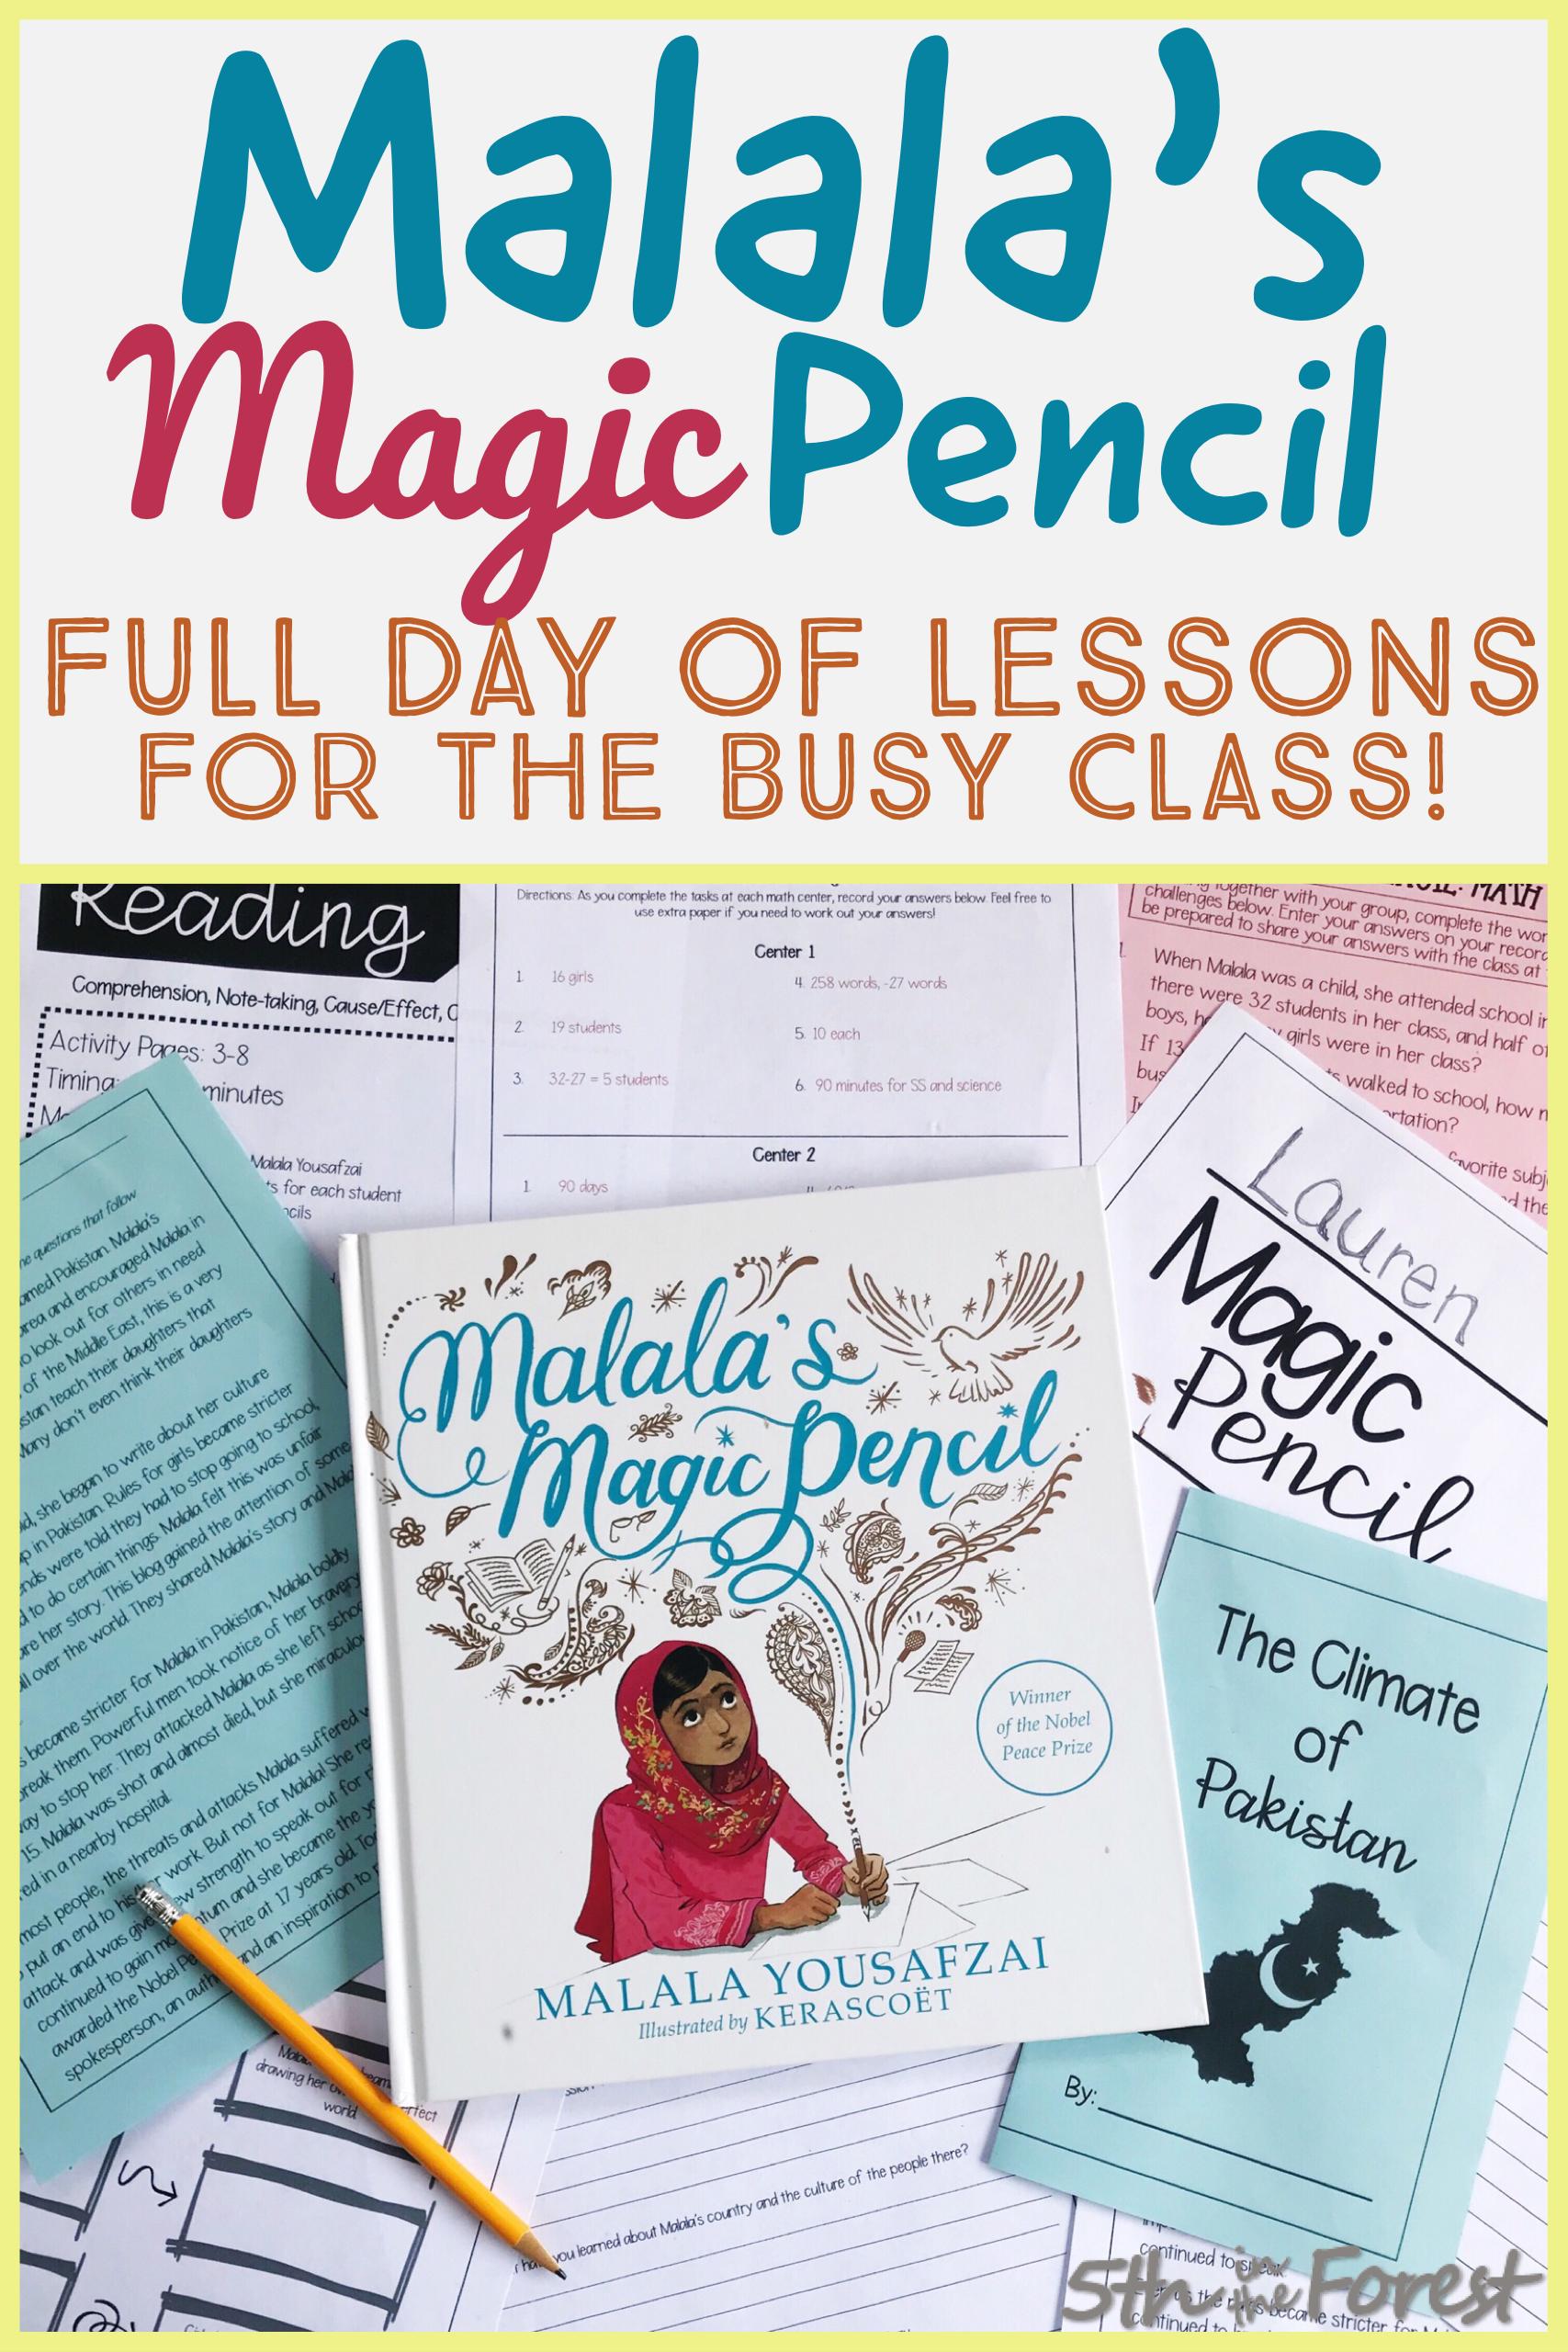 Malala S Magic Pencil Full Day Of Lesson Plans